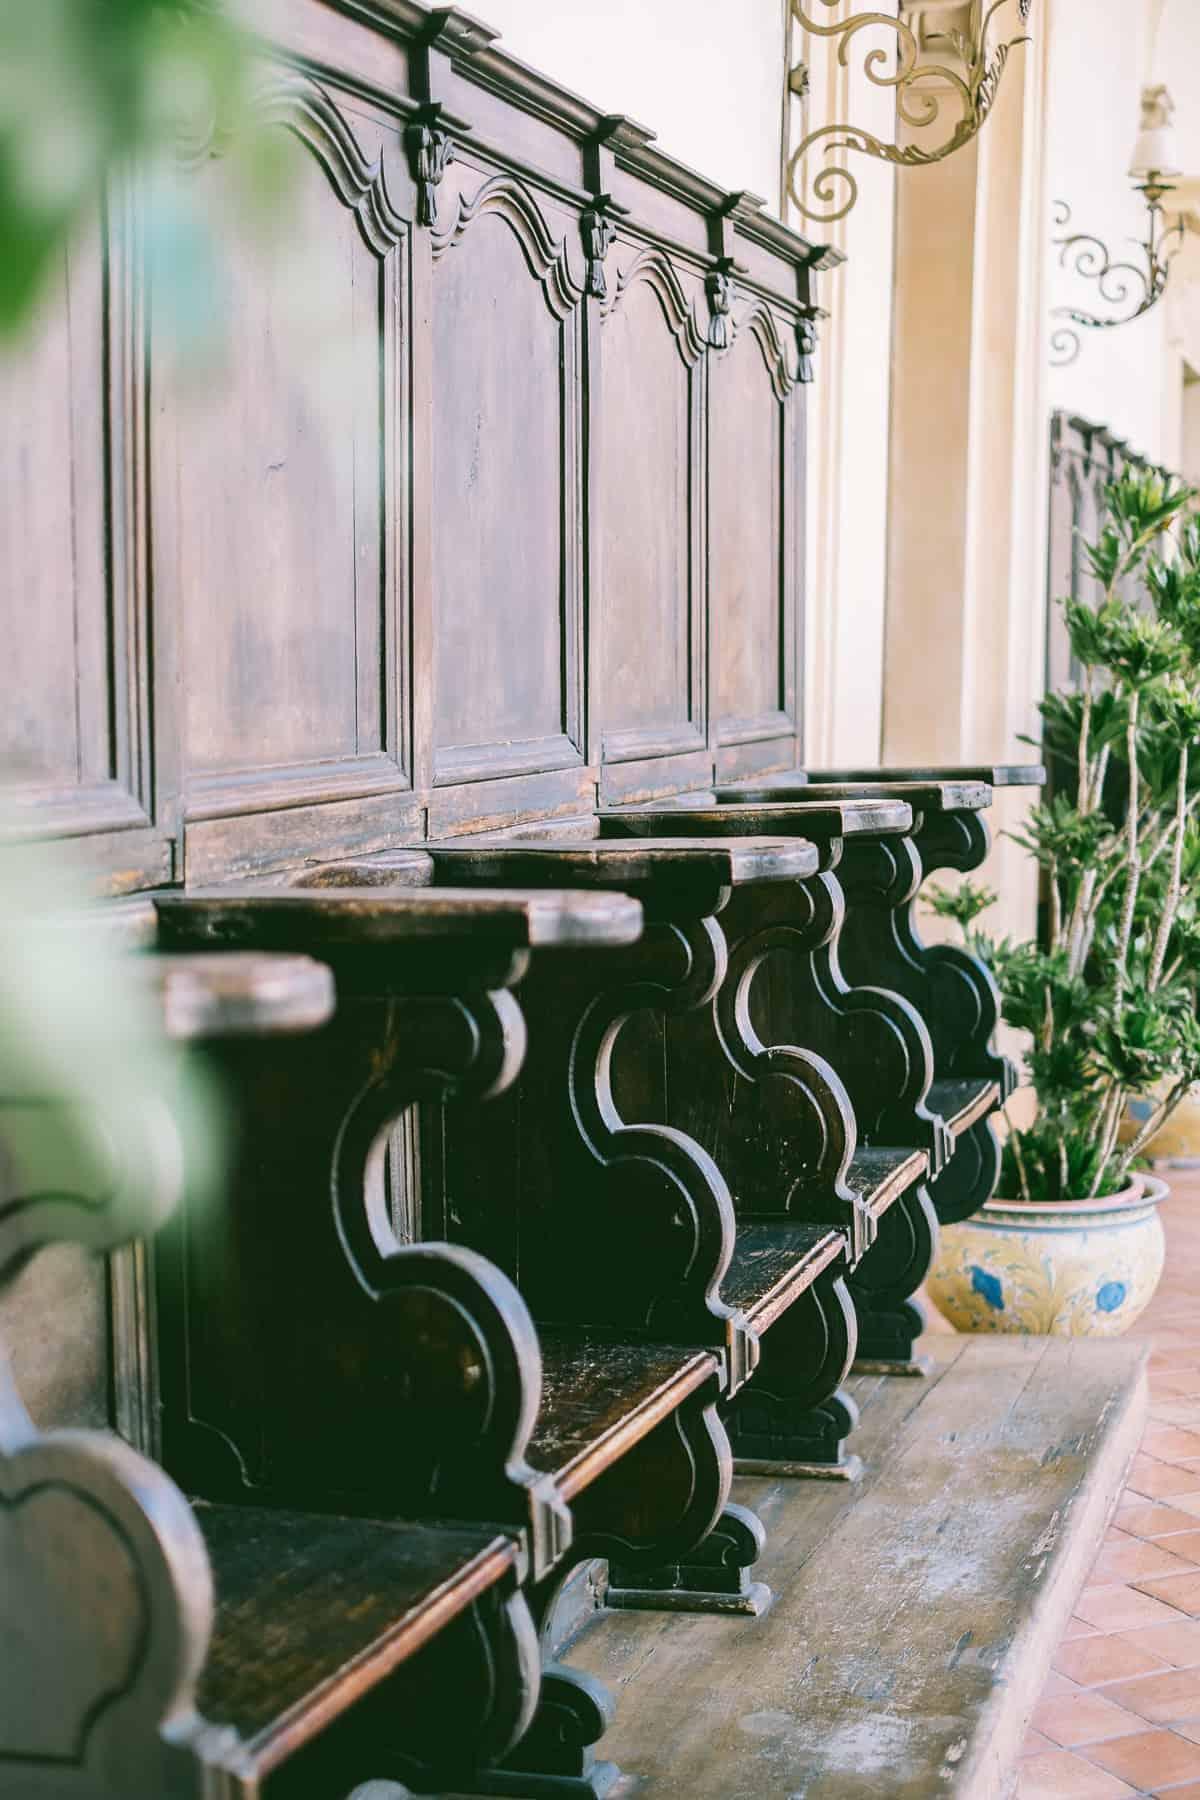 church pews inside the San Domenico Palace Hotel Taormina Sicily